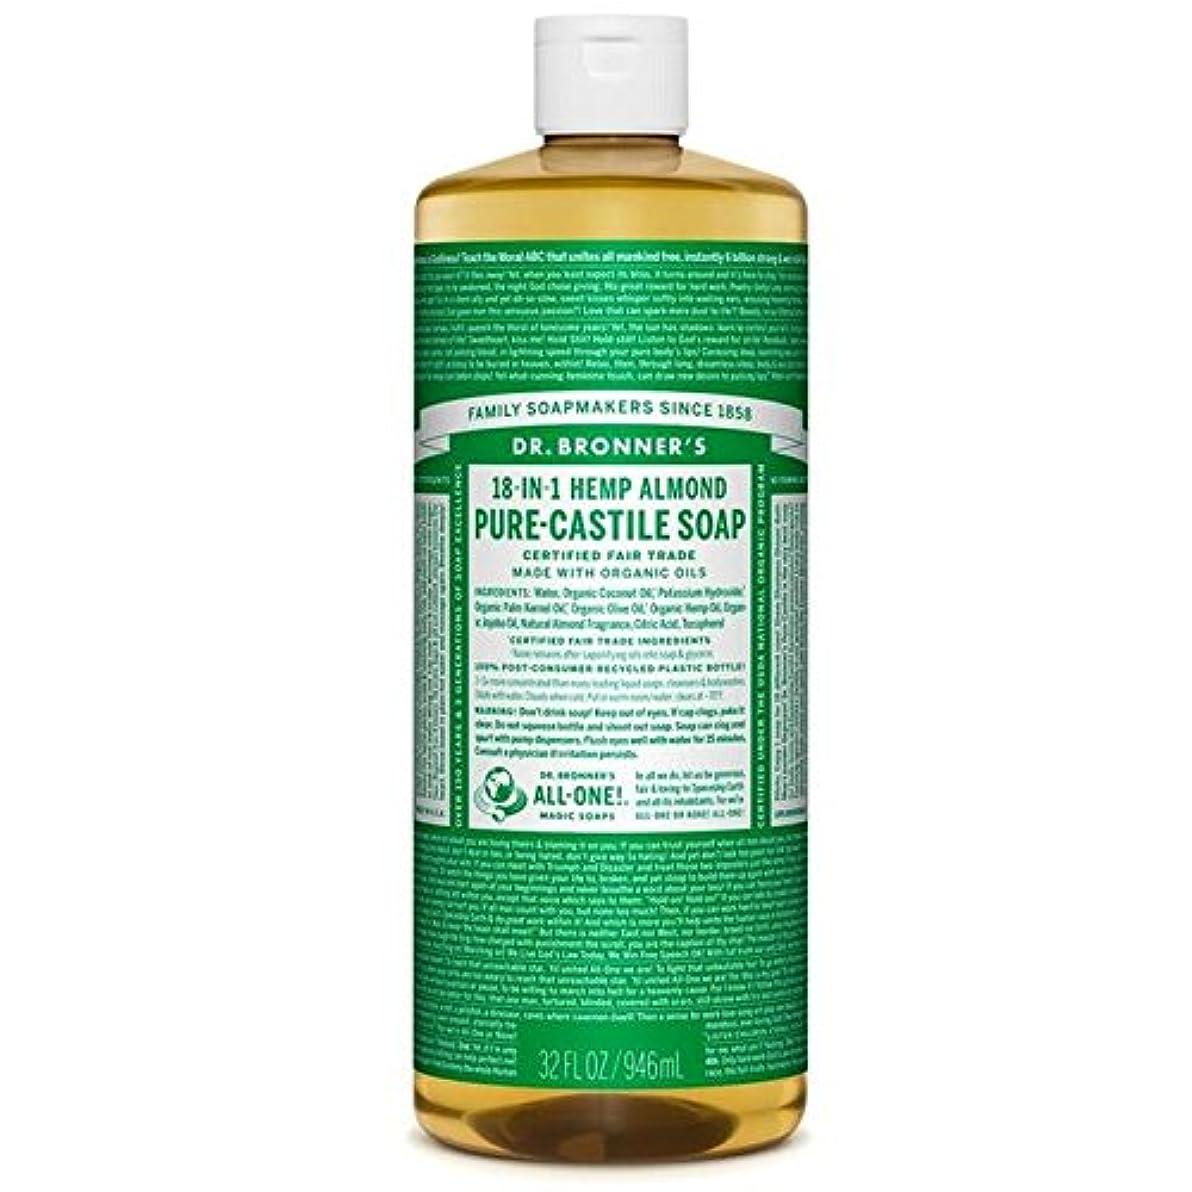 Dr Bronner Organic Almond Castile Liquid Soap 946ml - のブロナー有機アーモンドカスティーリャ液体石鹸946ミリリットル [並行輸入品]